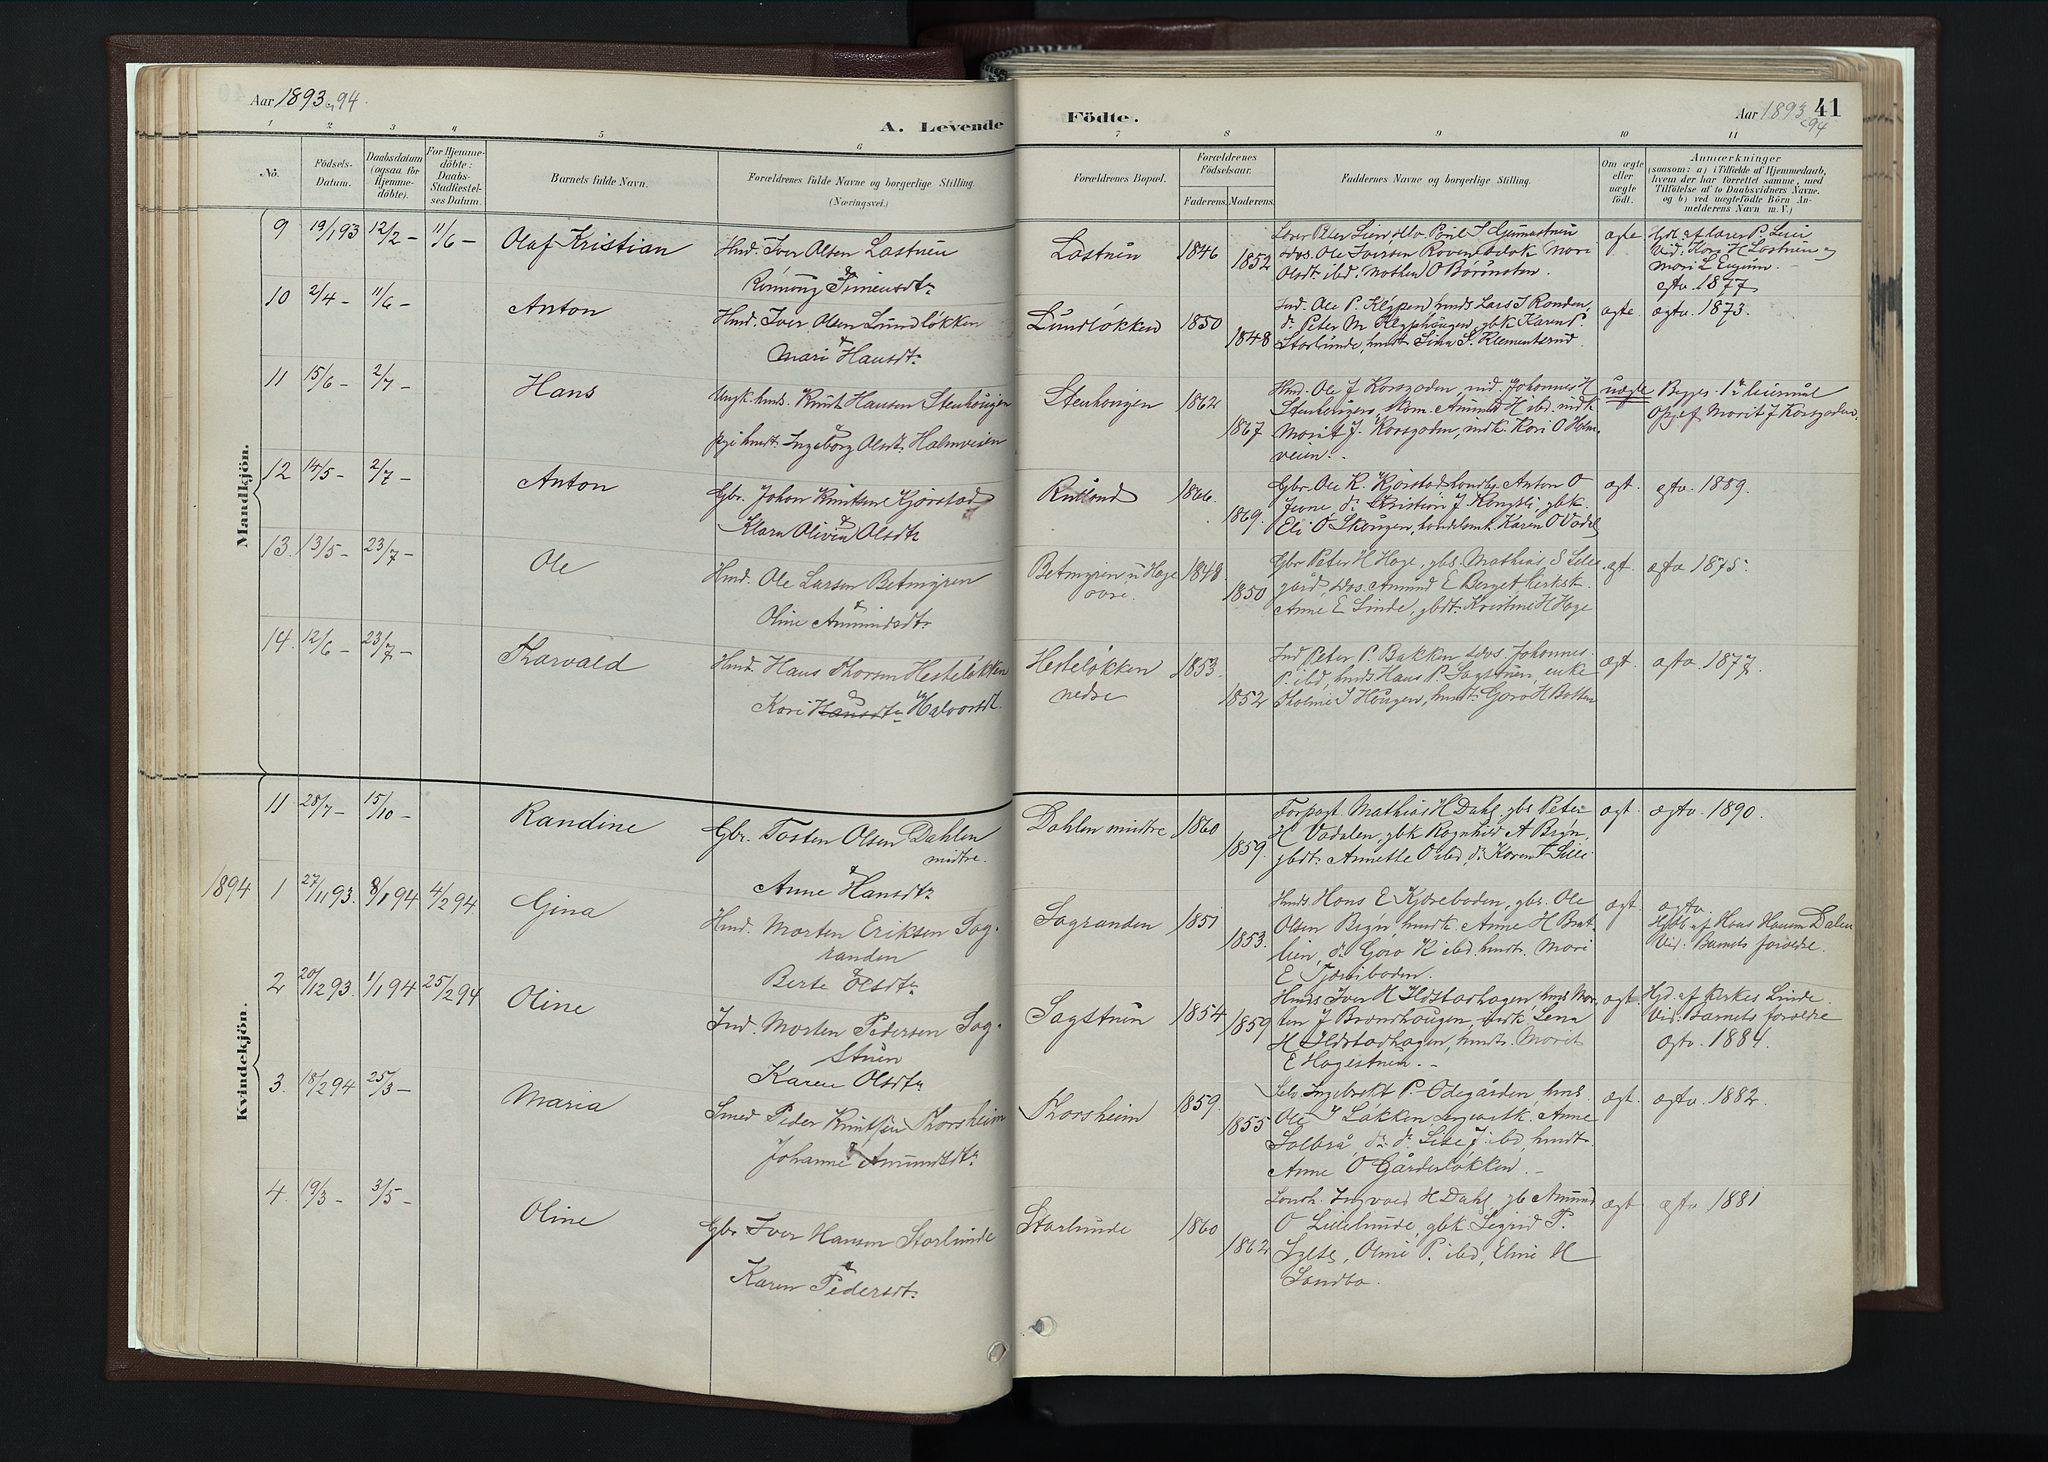 SAH, Nord-Fron prestekontor, Ministerialbok nr. 4, 1884-1914, s. 41